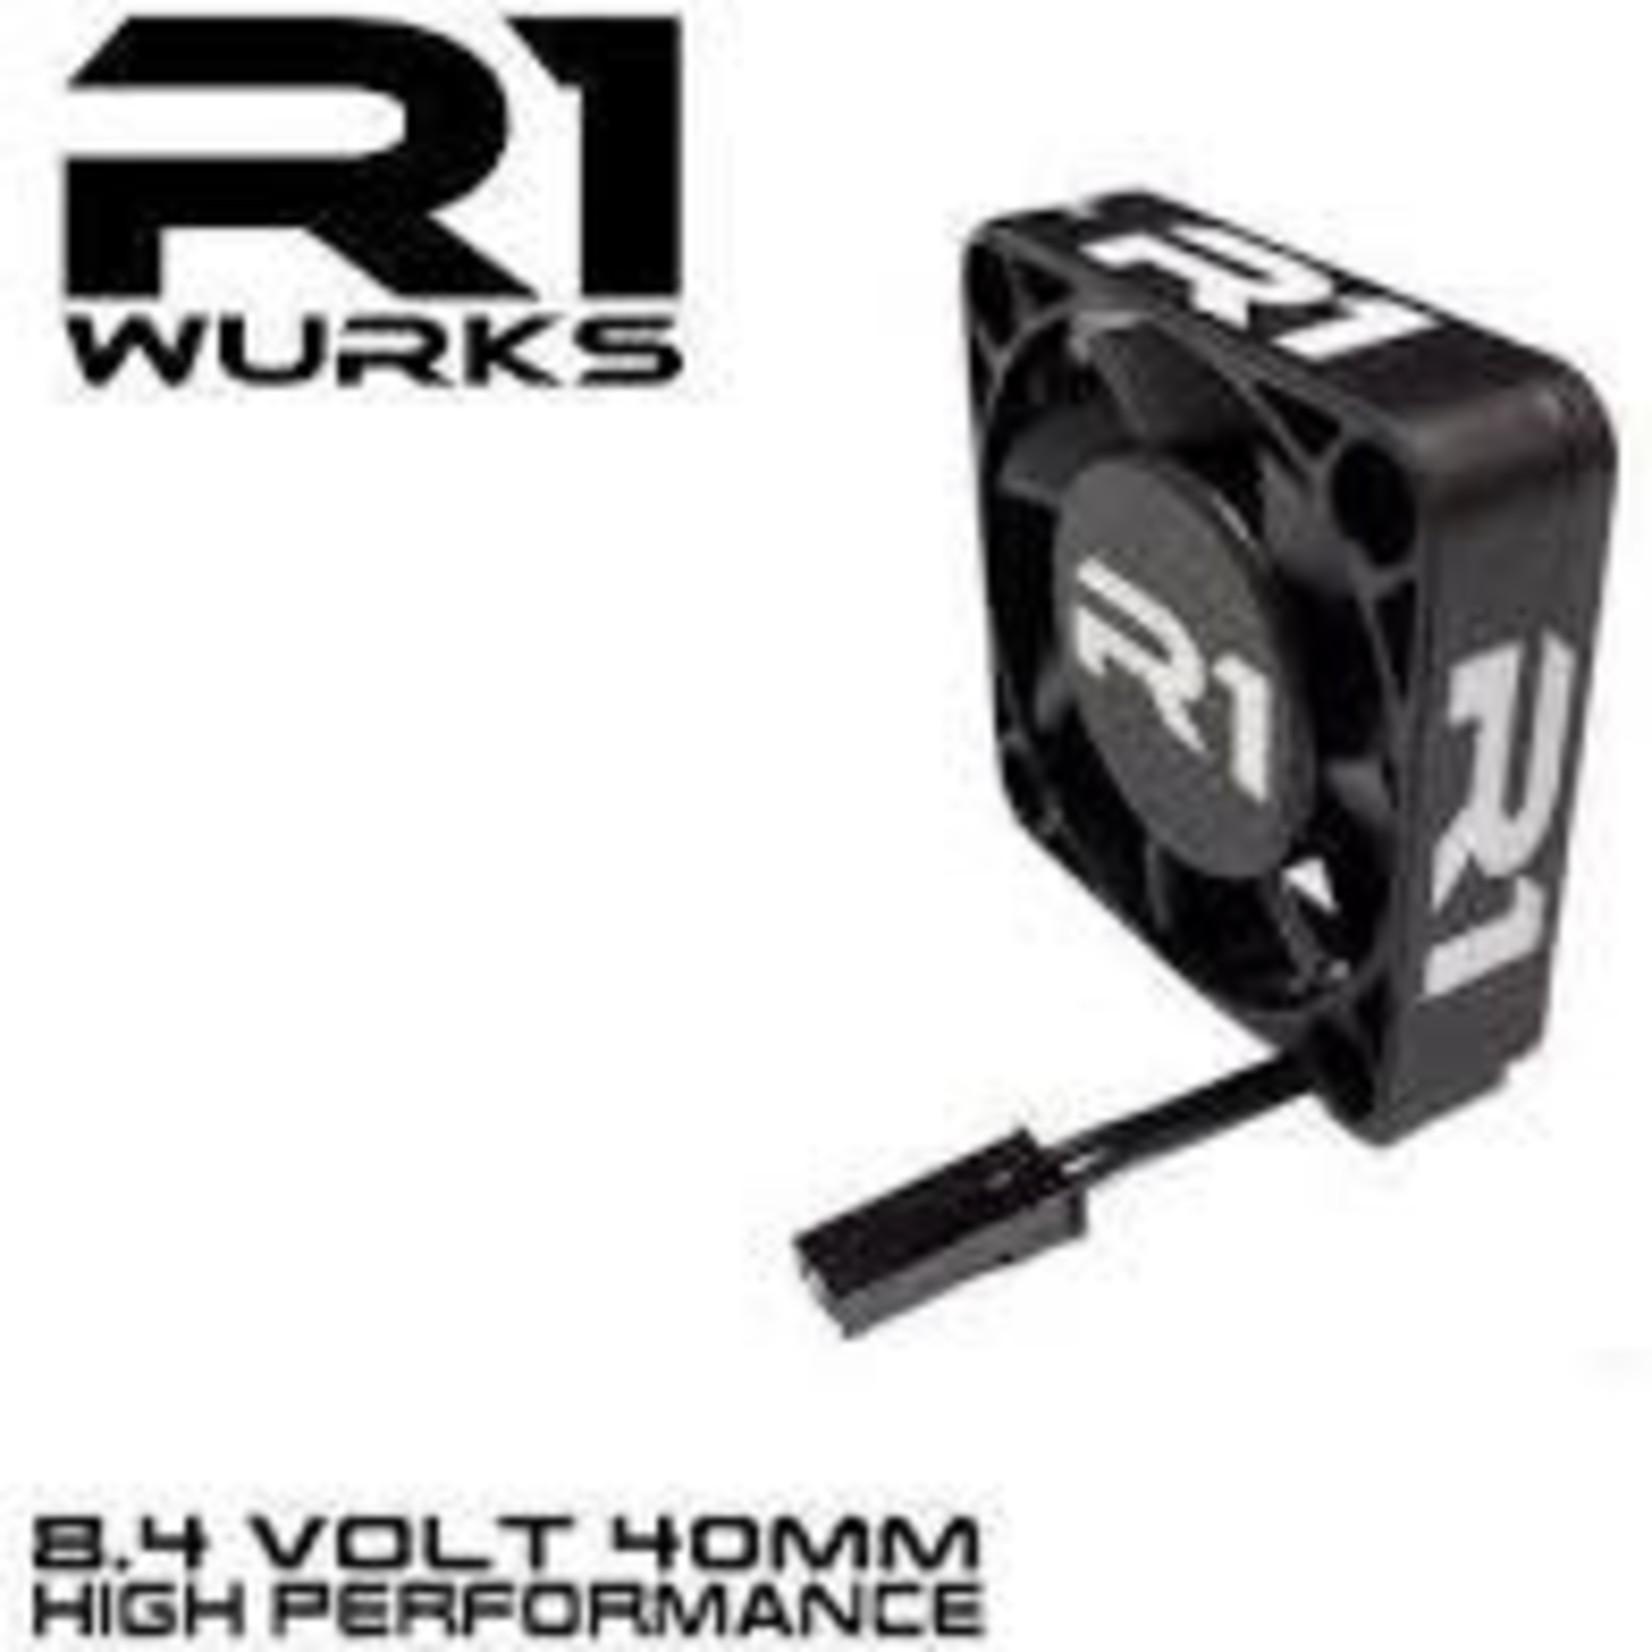 R1 Wurks R1 8.4V Premium 40mm Fan